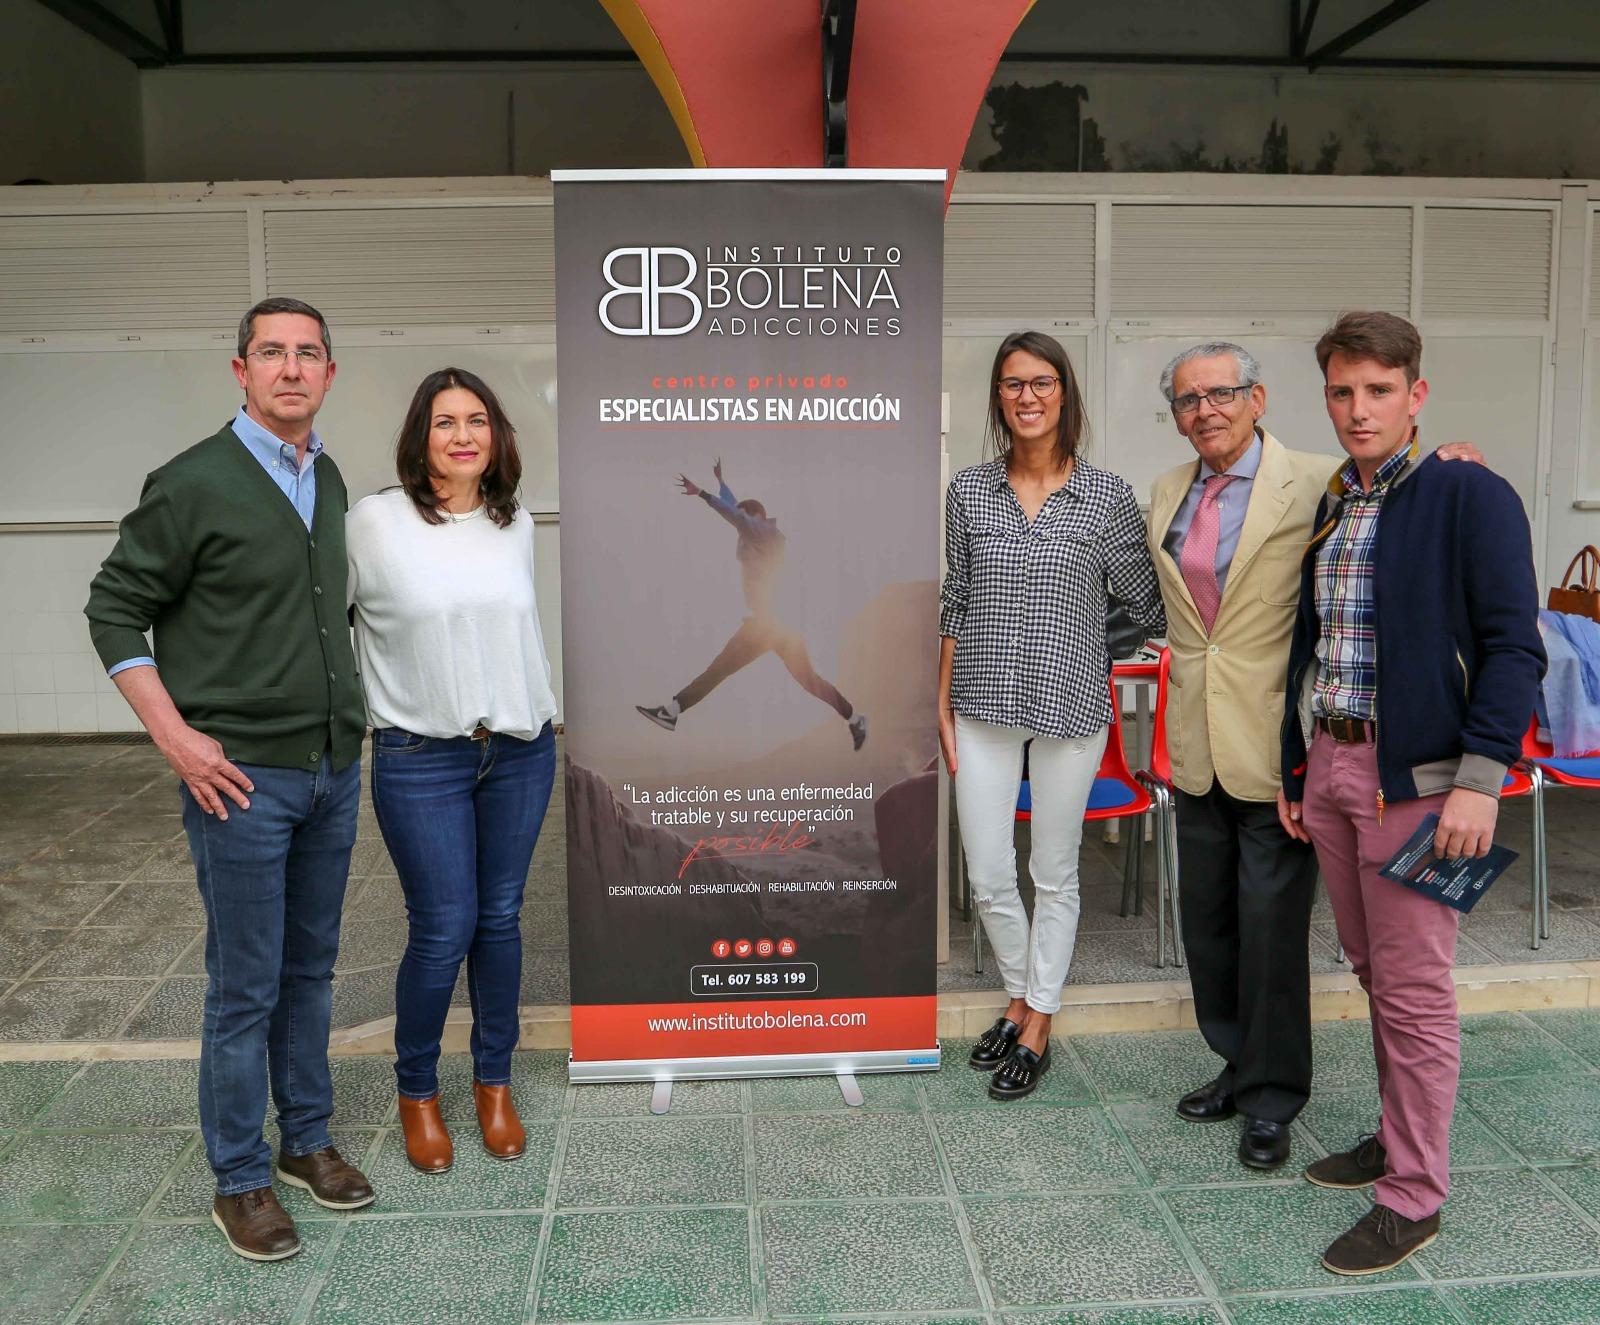 Charla informativa en el mes cultural de La Roda de Andalucía.